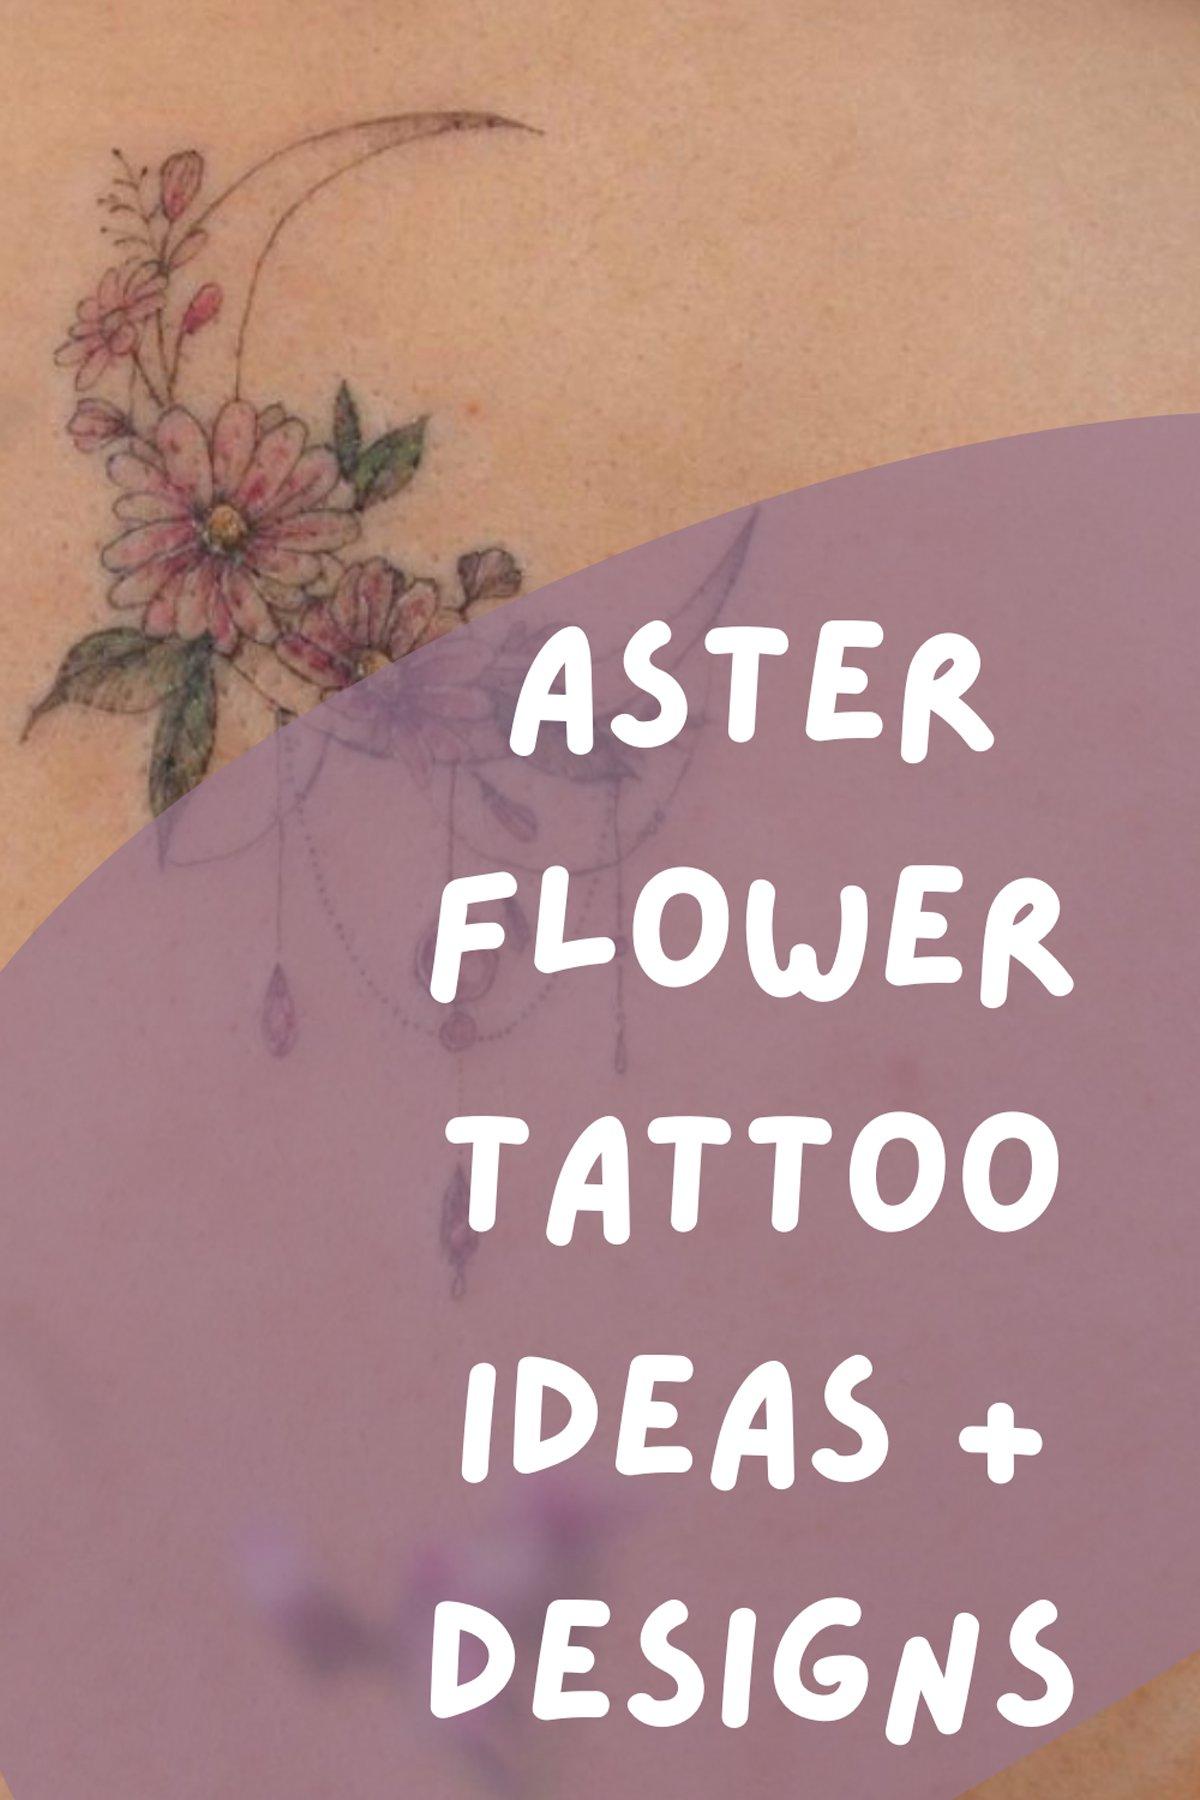 Aster Flower Tattoo Ideas & Designs